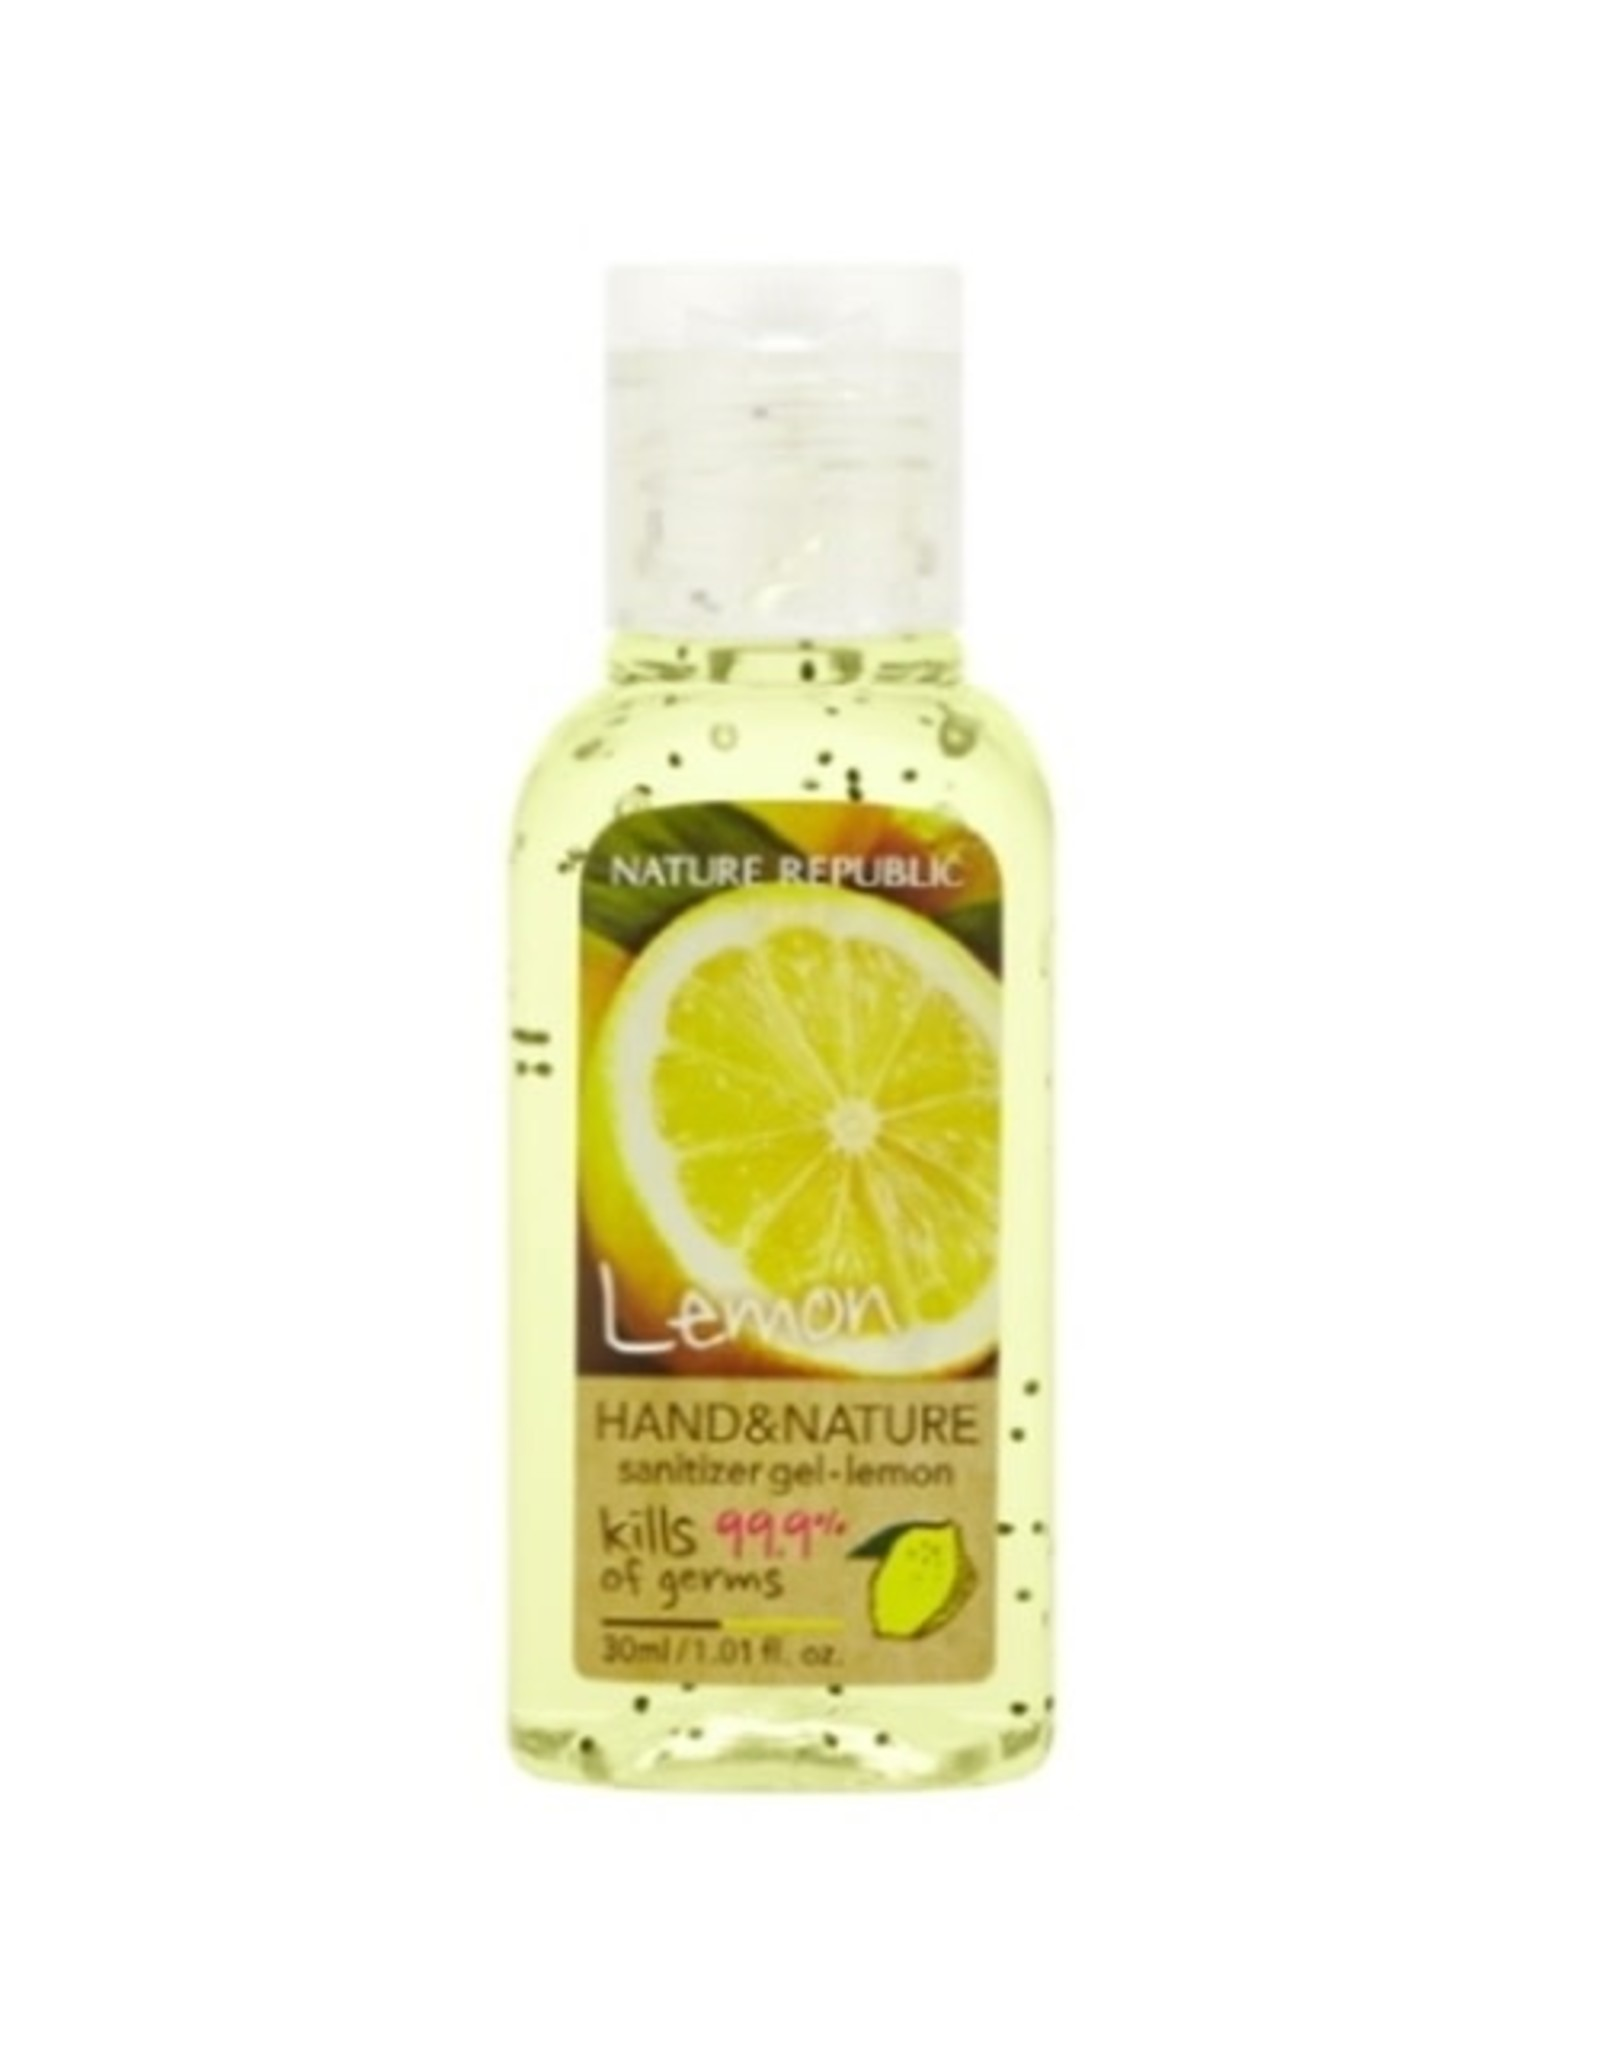 Hand & Nature Sanitizer Gel-Lemon